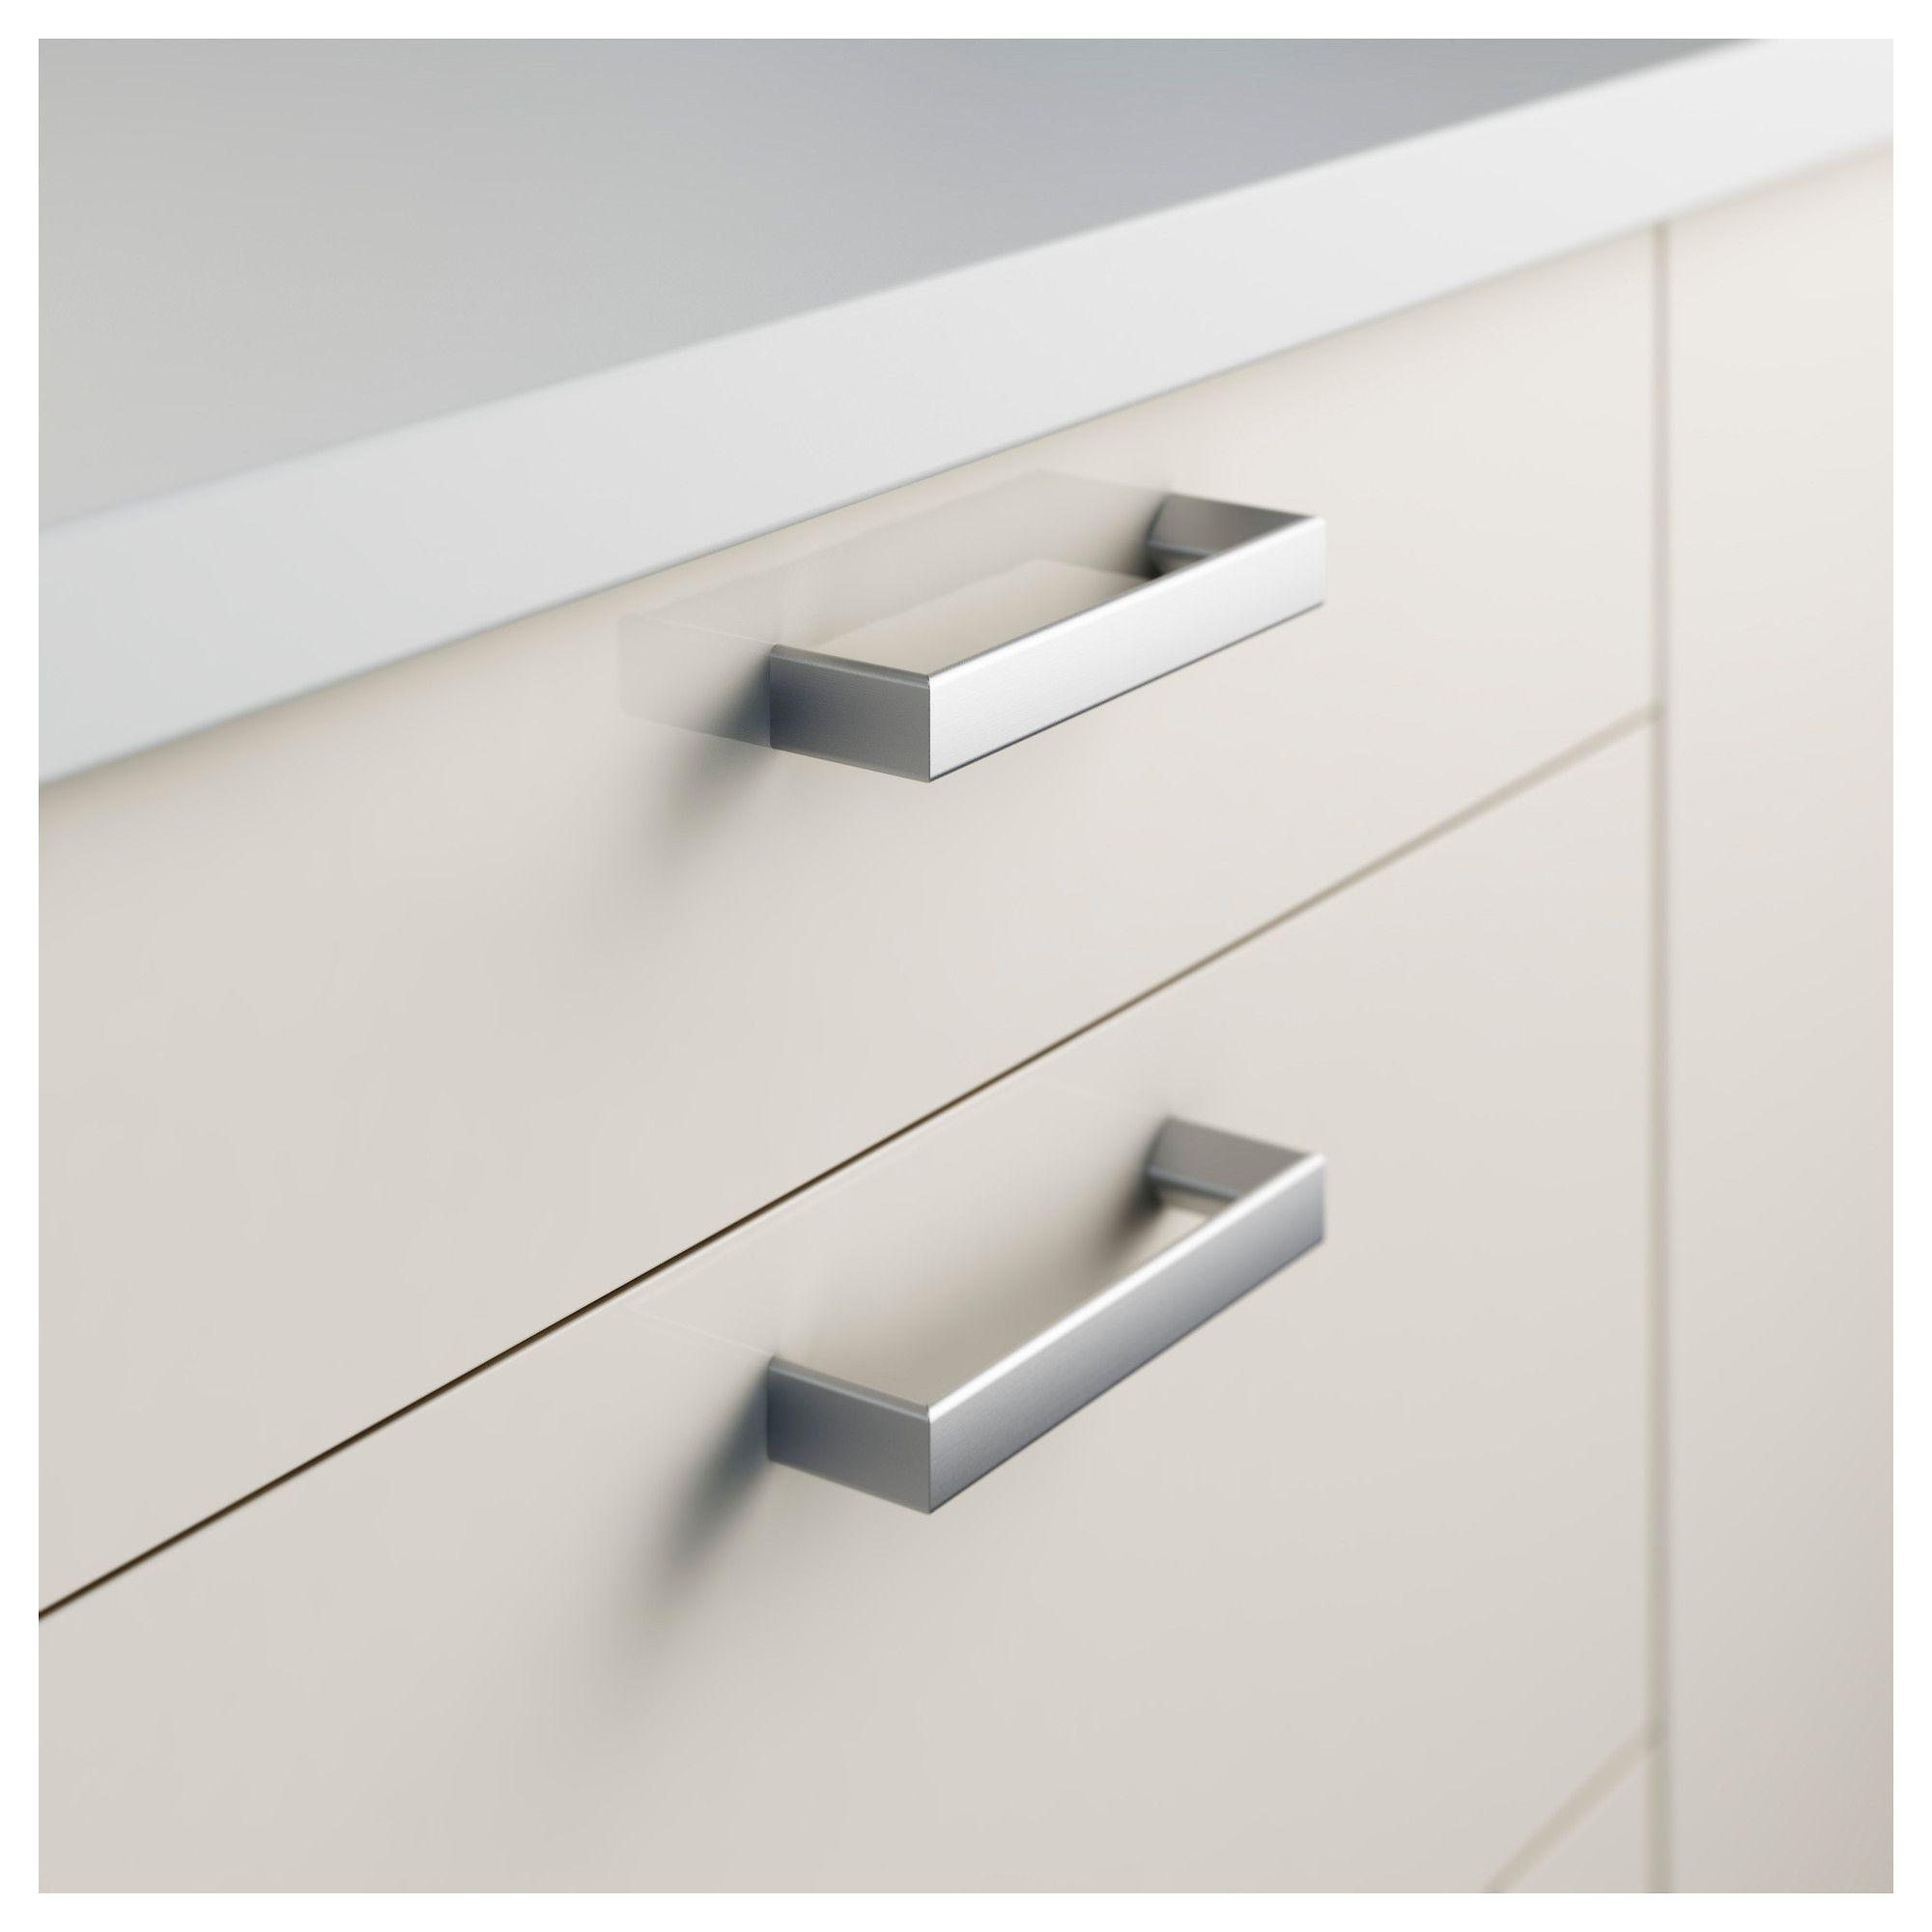 ikea kitchen cabinet handles cabinets cost estimate tyda handle stainless steel design kuche schrank brass reno new